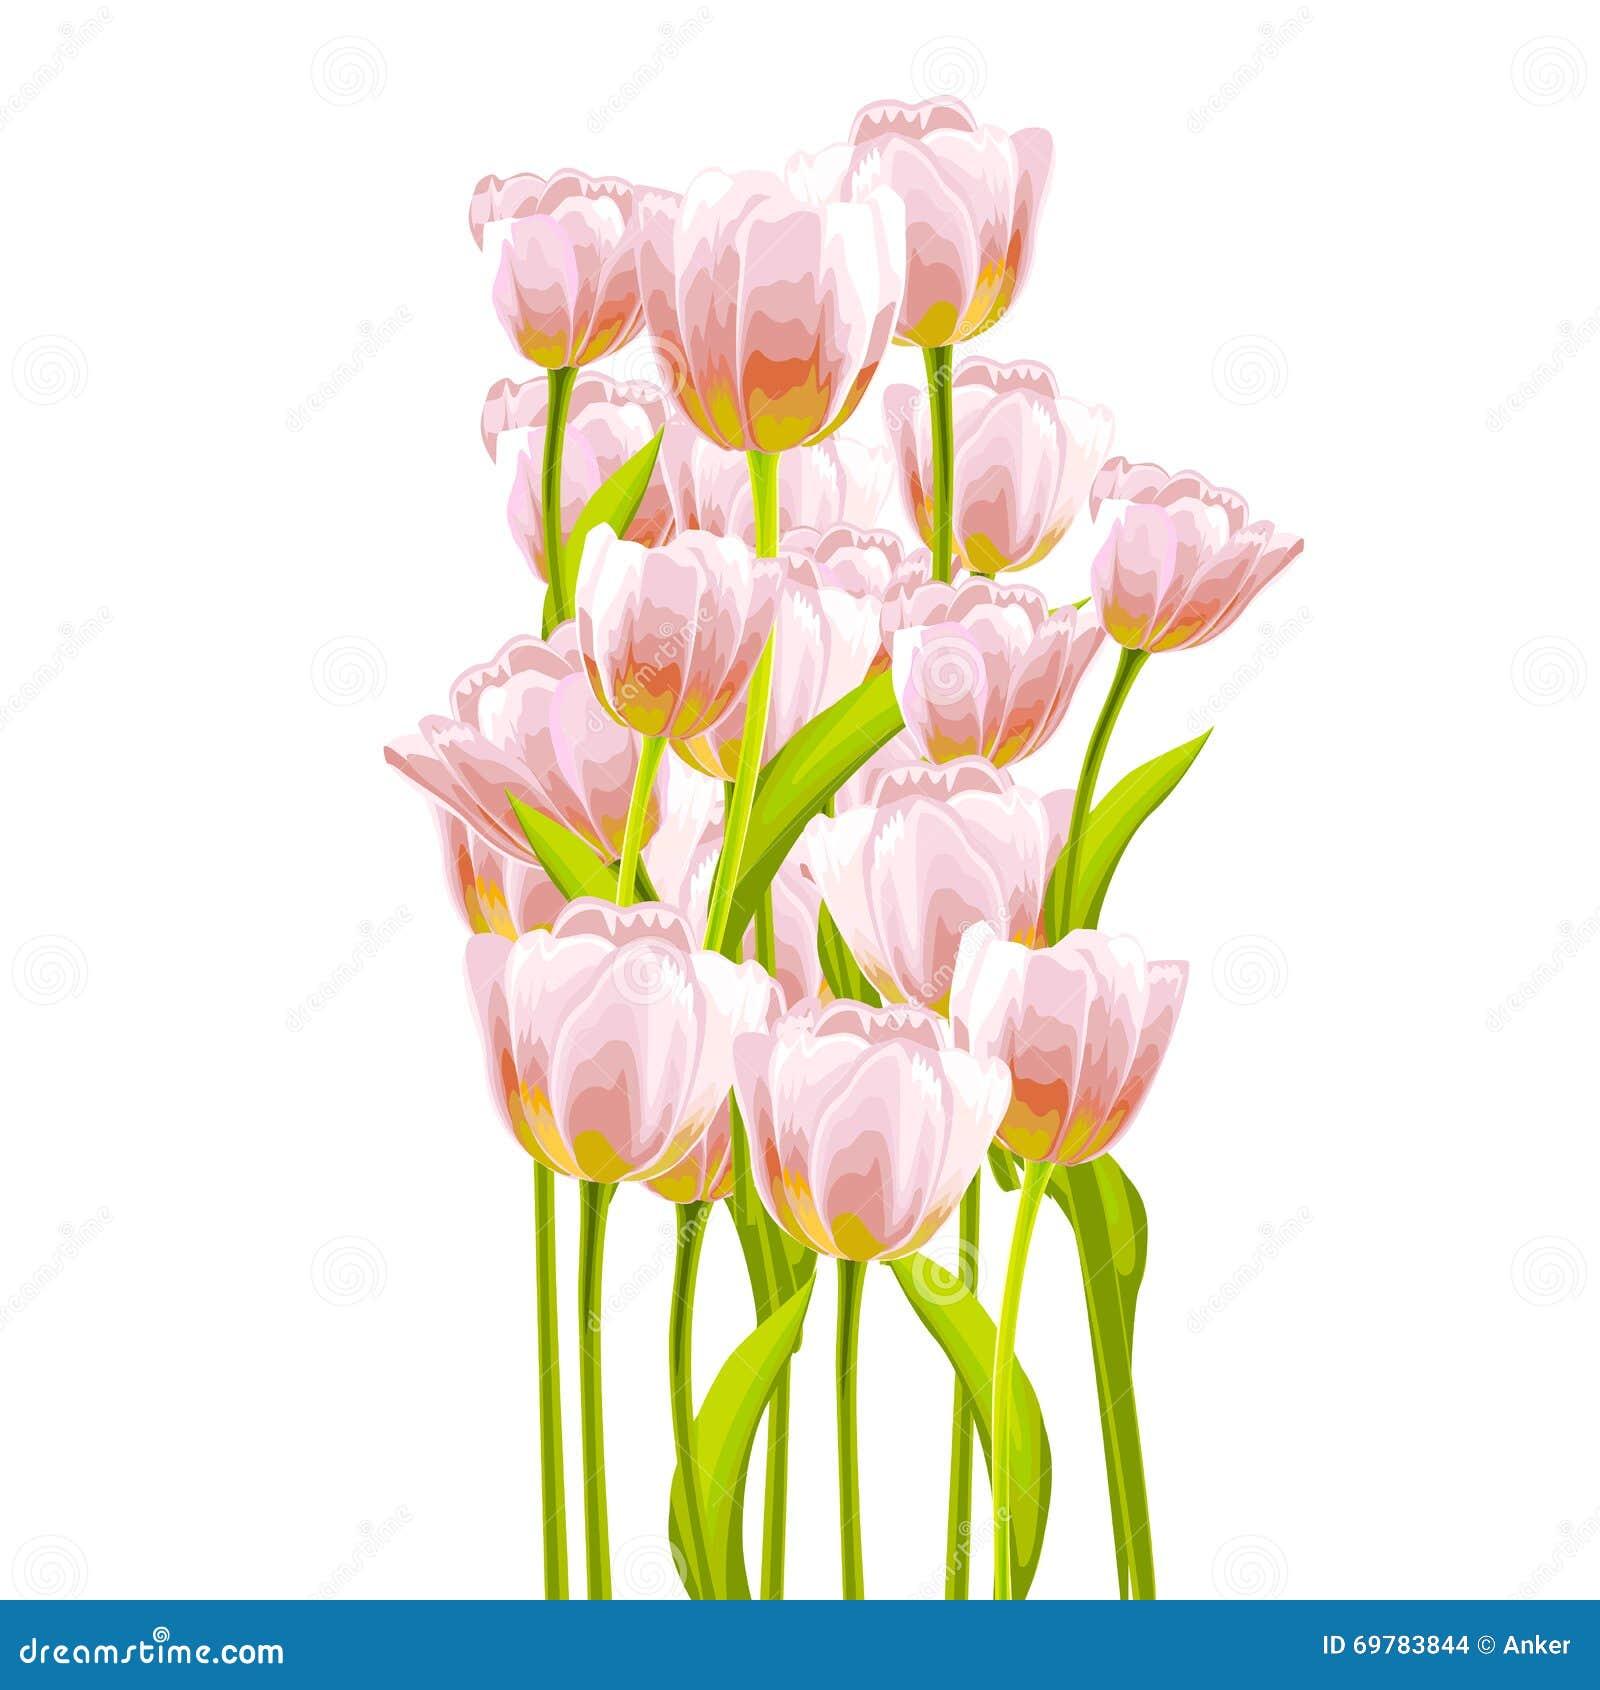 Flower Tulip Background. Stock Vector. Illustration Of